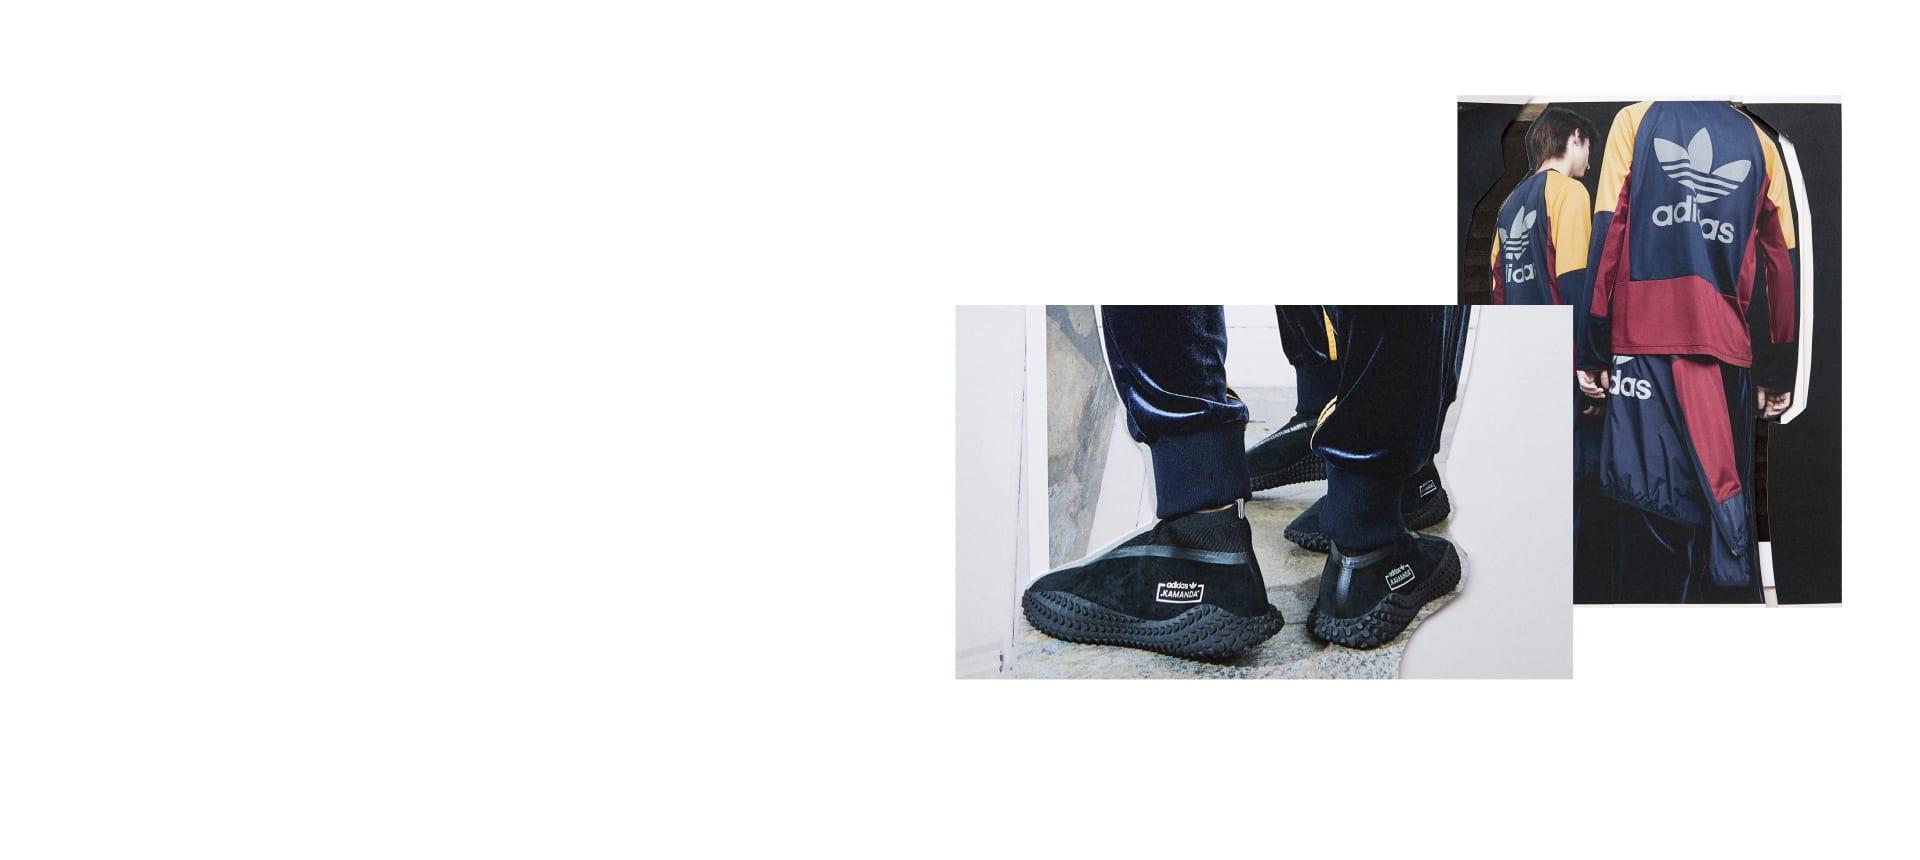 adidas ORIGINALS TOP TEN HI SLEEK HE DAMEN FREIZEITSCHUHE, weiss